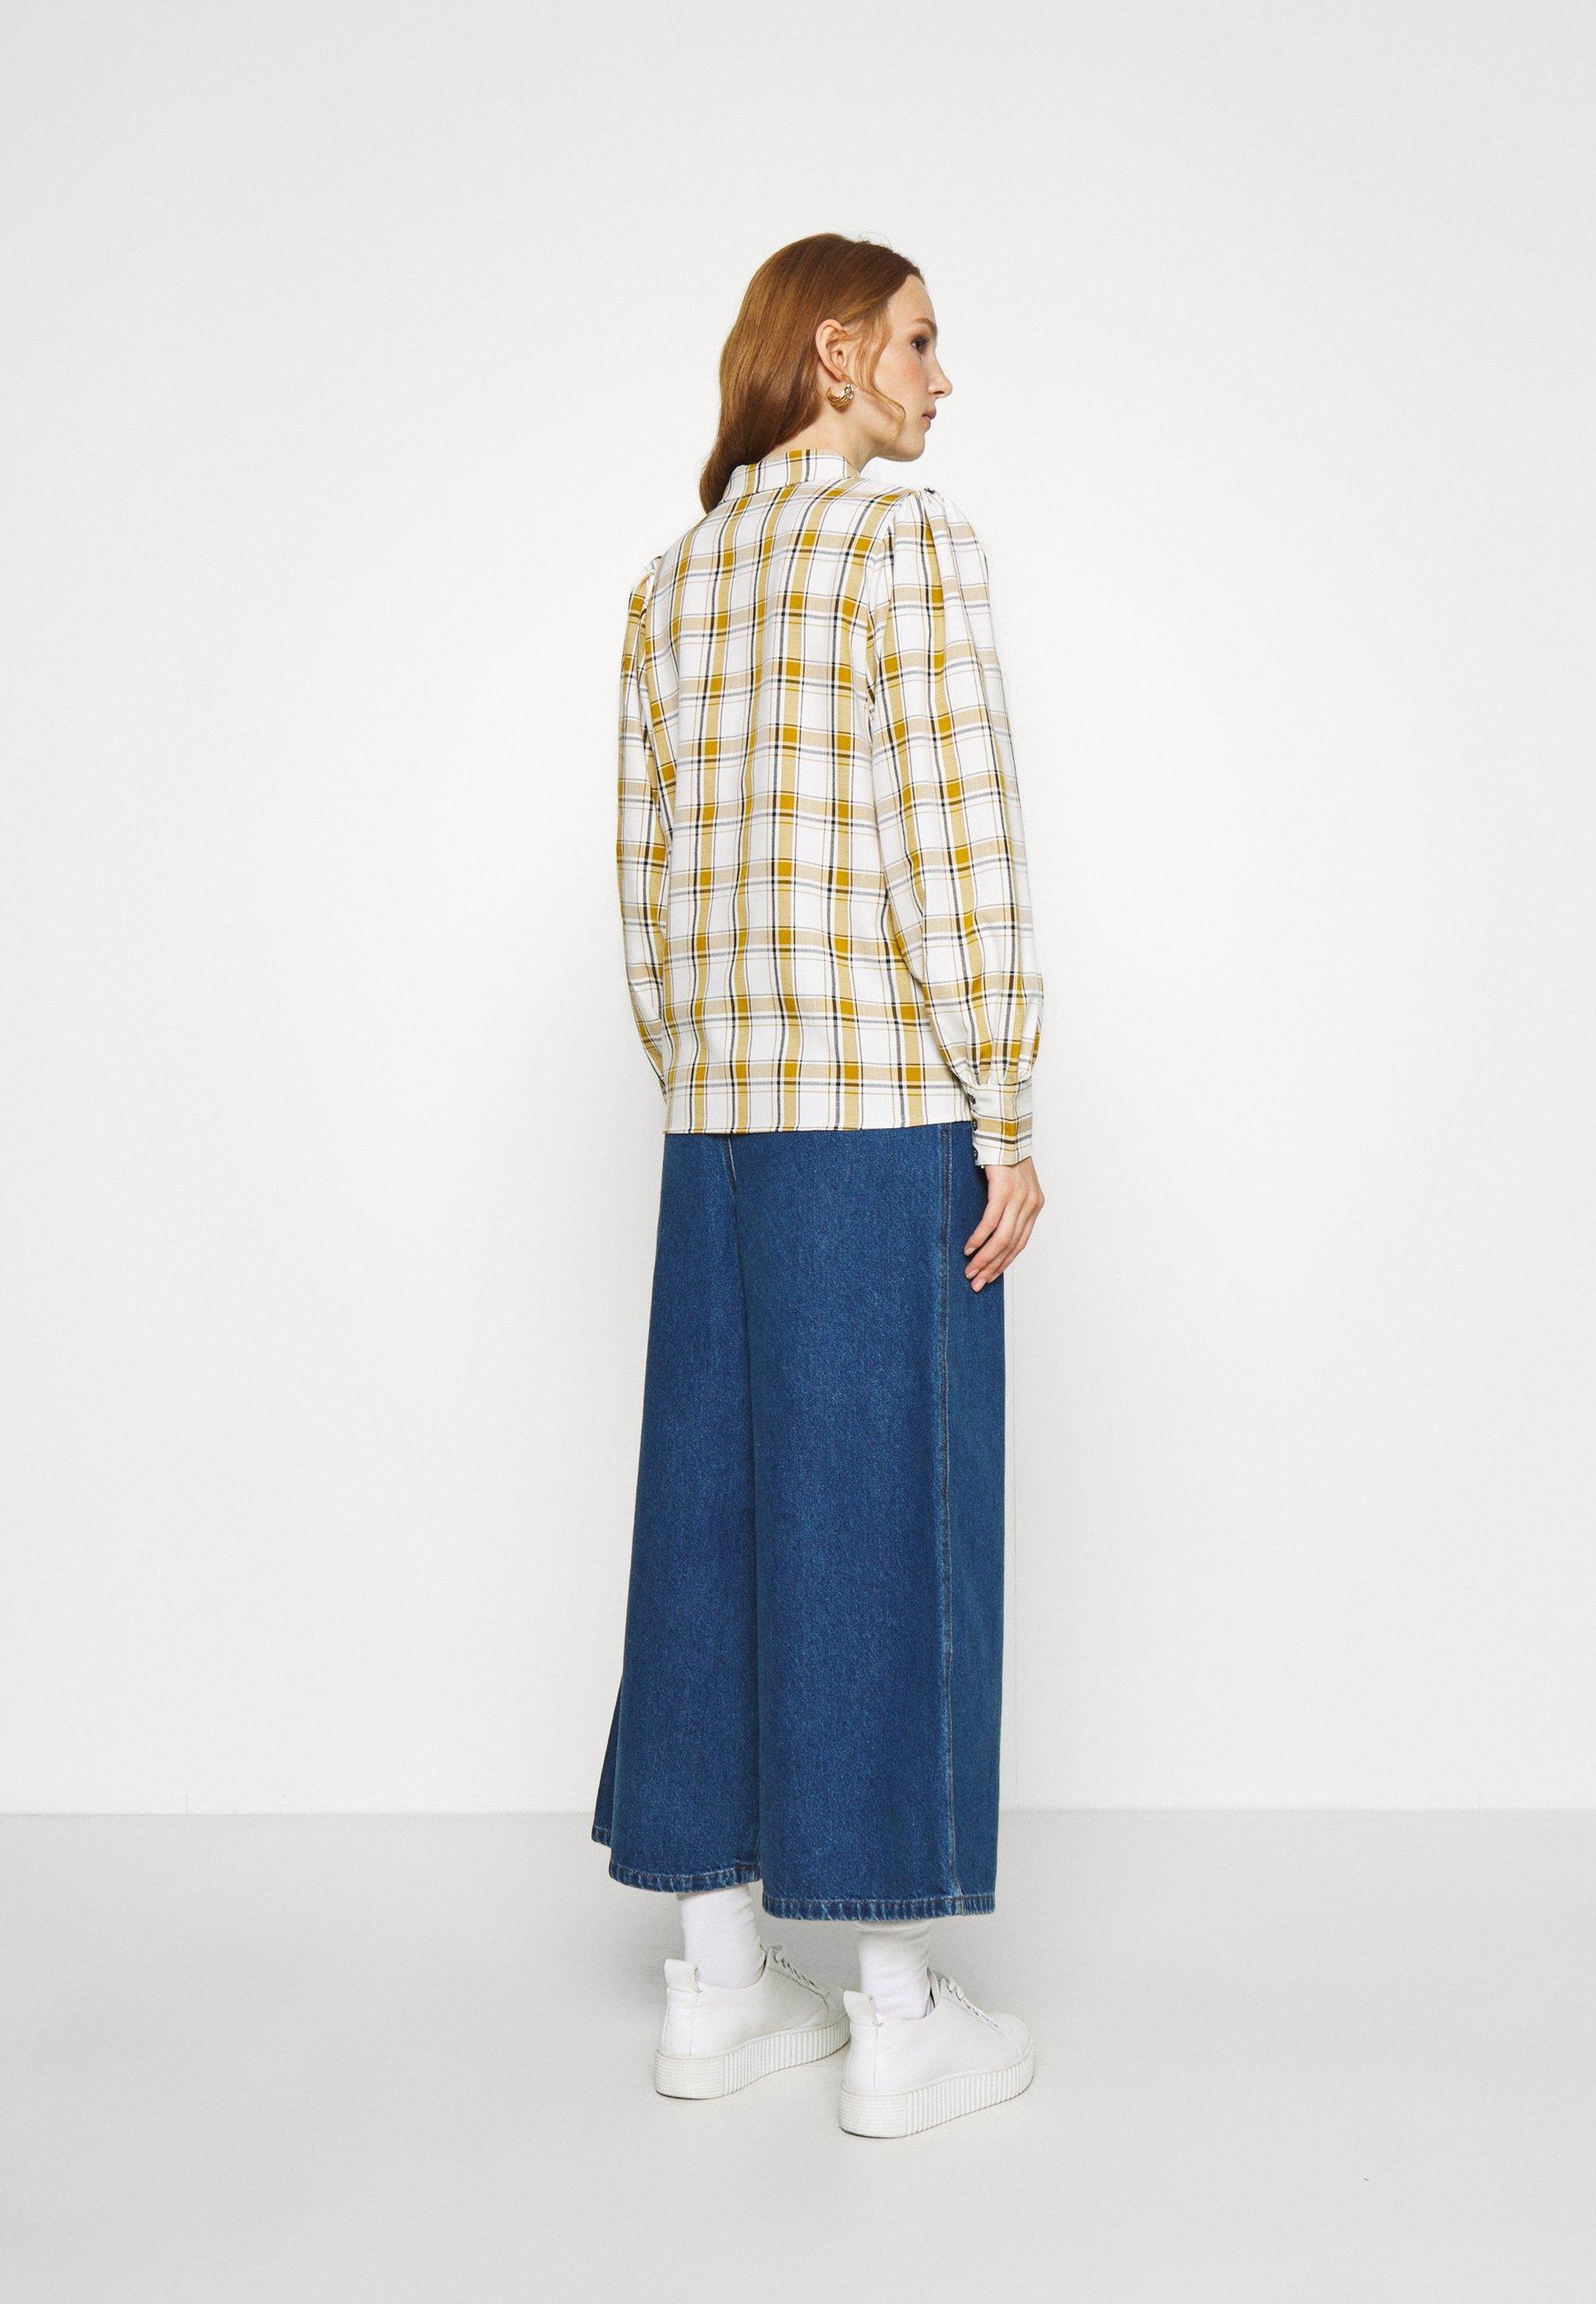 Best Authentic Women's Clothing Gestuz Button-down blouse yellow M0HhIbGym